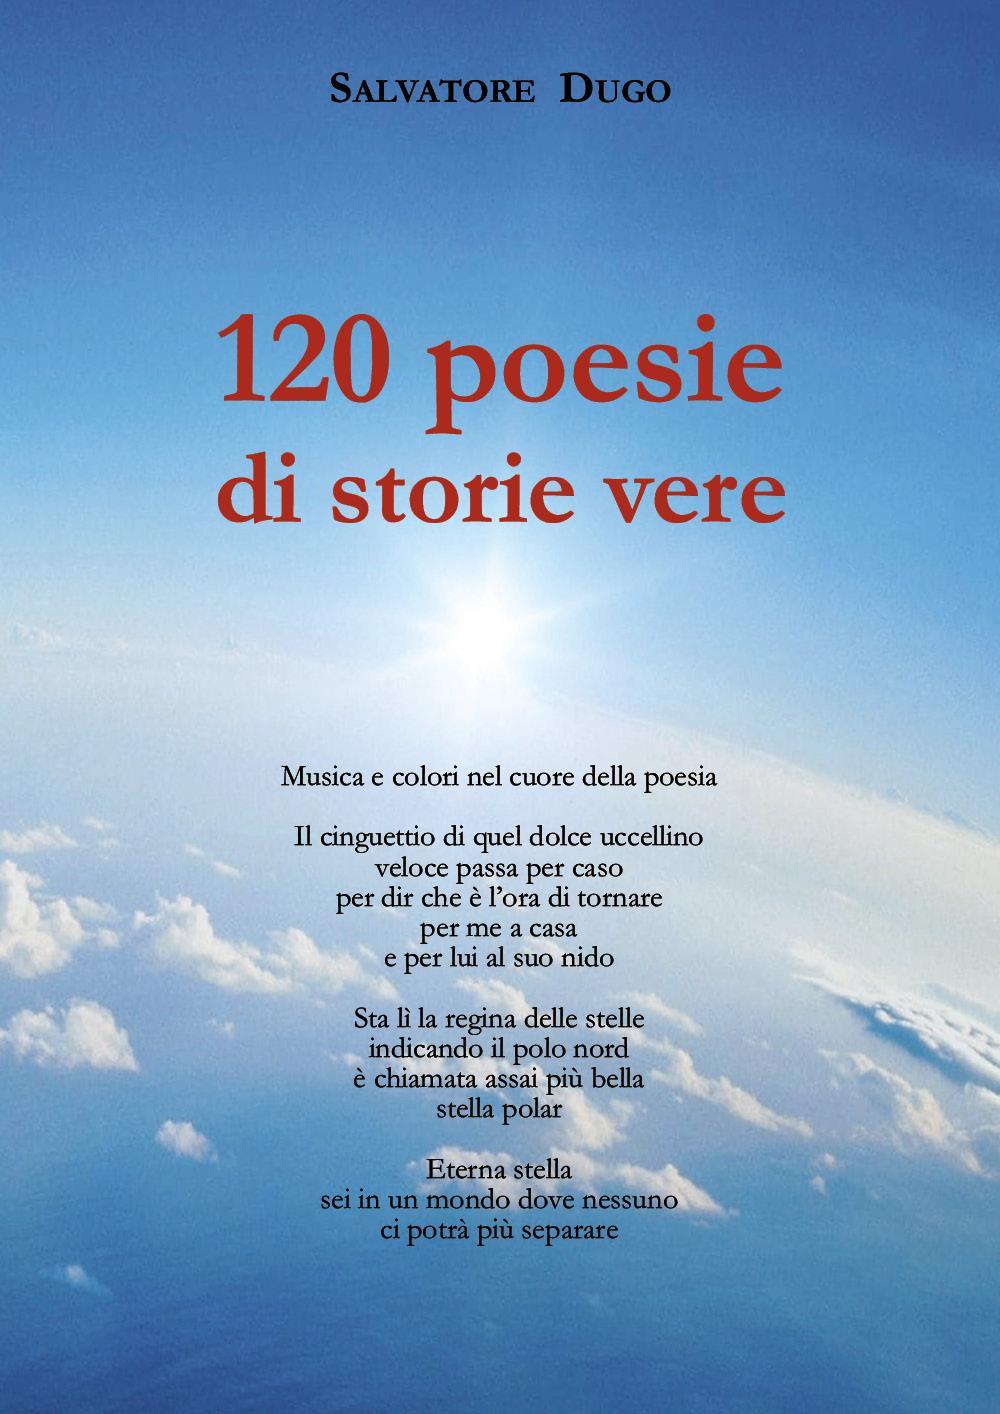 120 poesie di storie vere